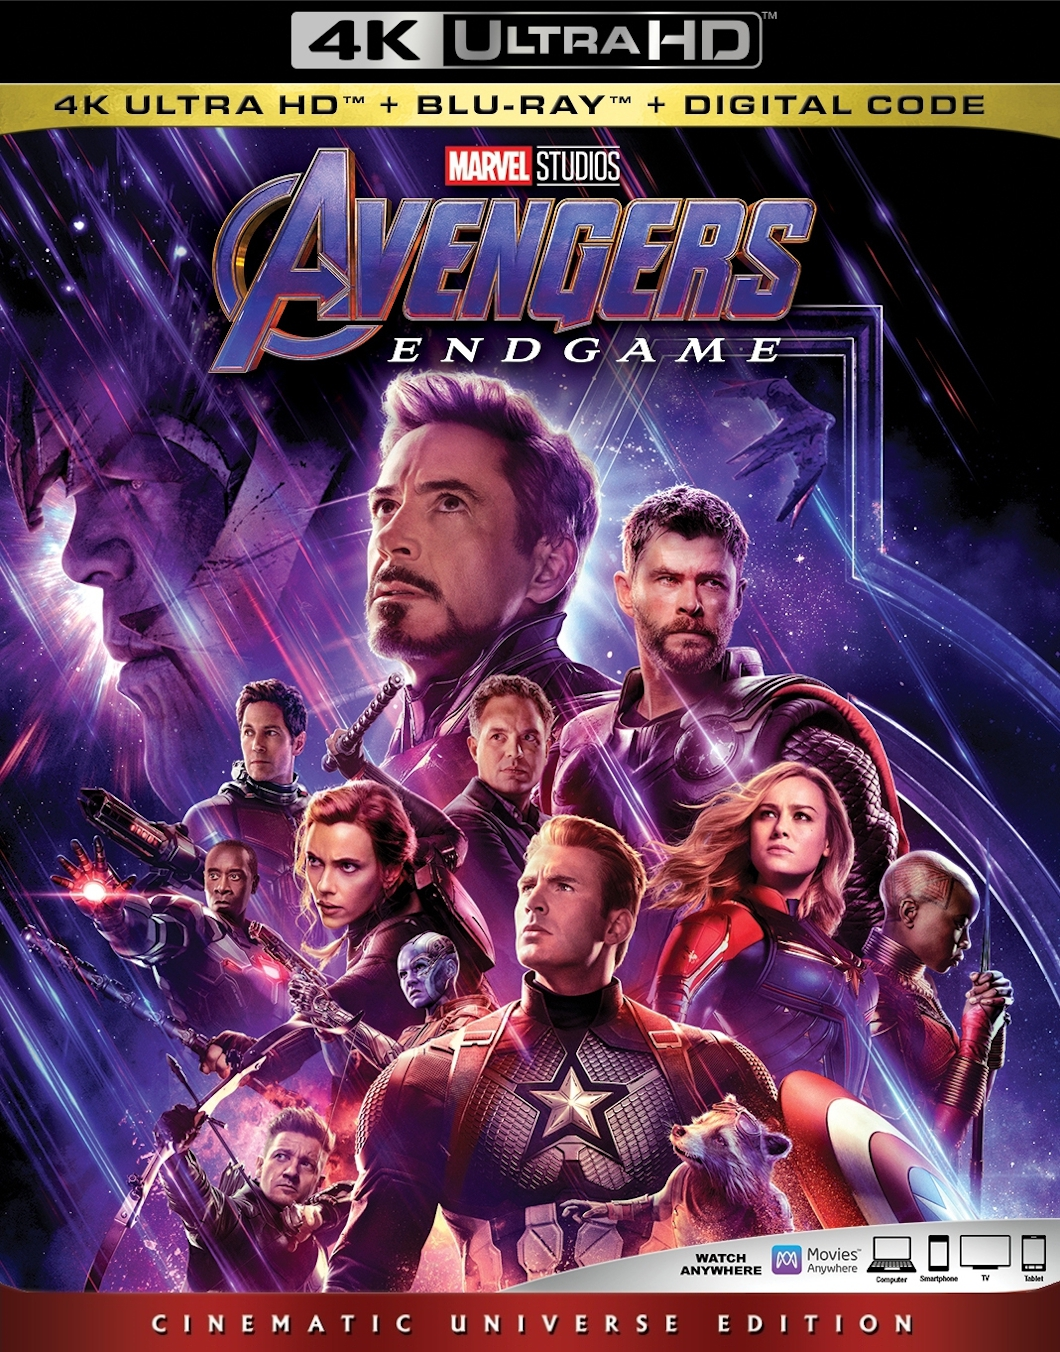 Avengers Endgame 4K UHD-  Best 4K Blu-ray Marvel Superhero Movies